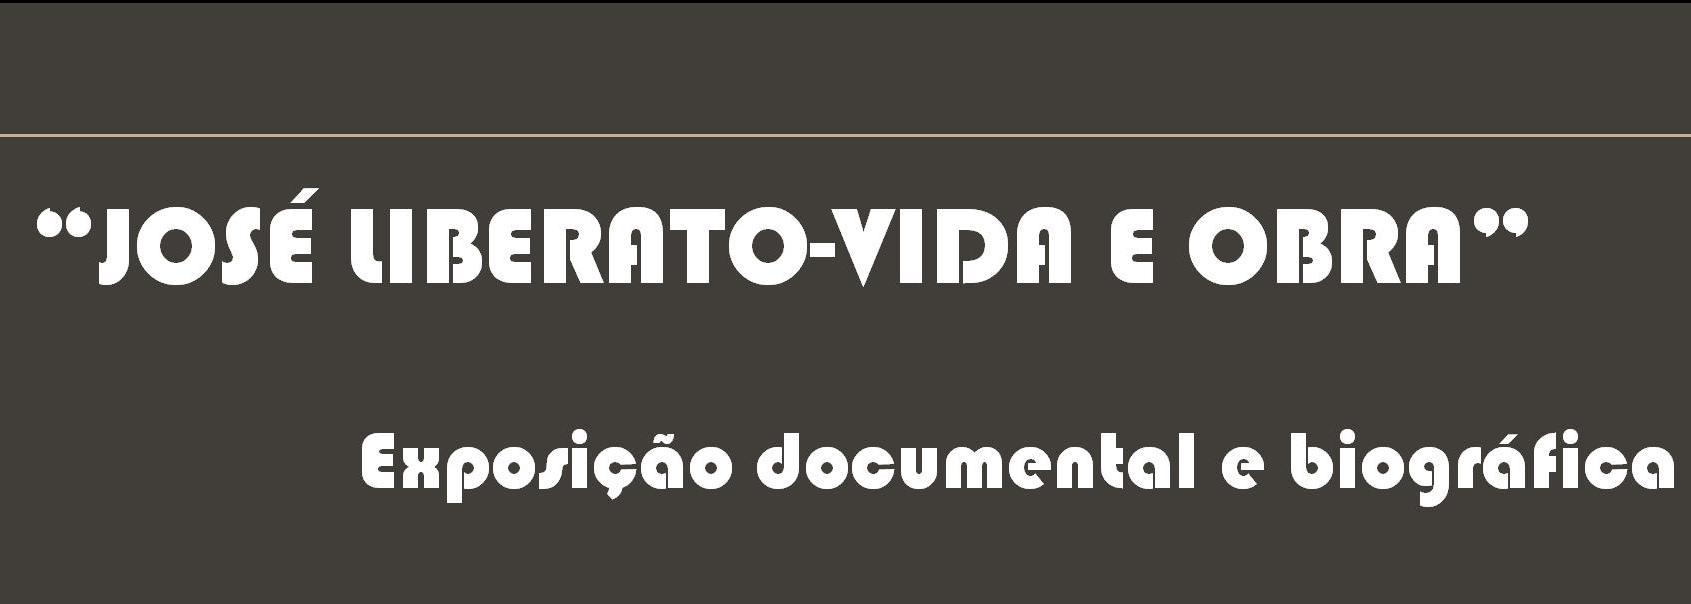 """José Liberato - Vida e Obra"" na Biblioteca Municipal de Barcelos"